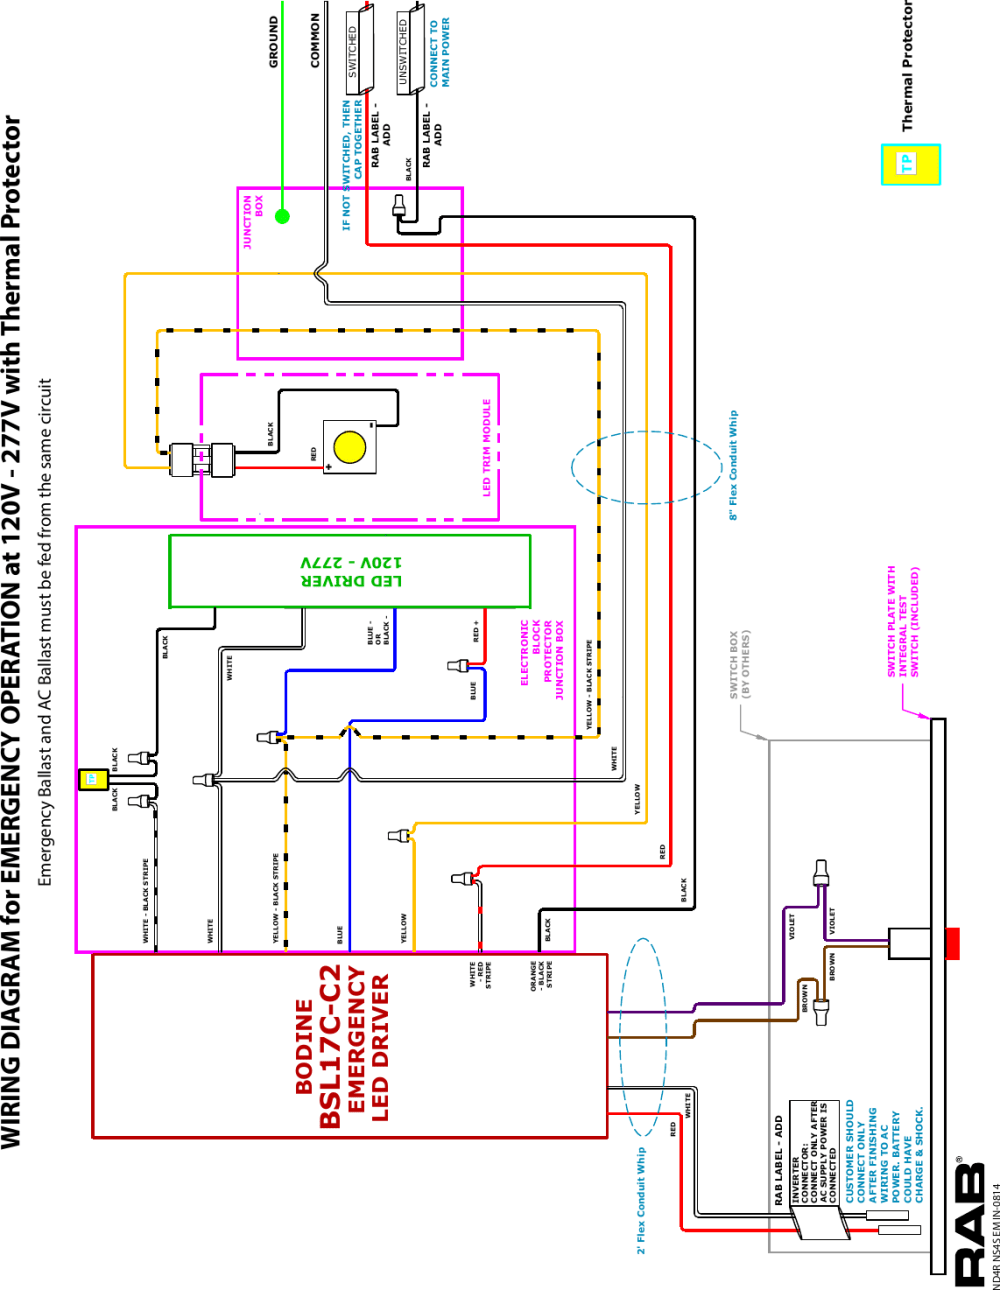 medium resolution of page 6 of 12 134831 installatioun sheet